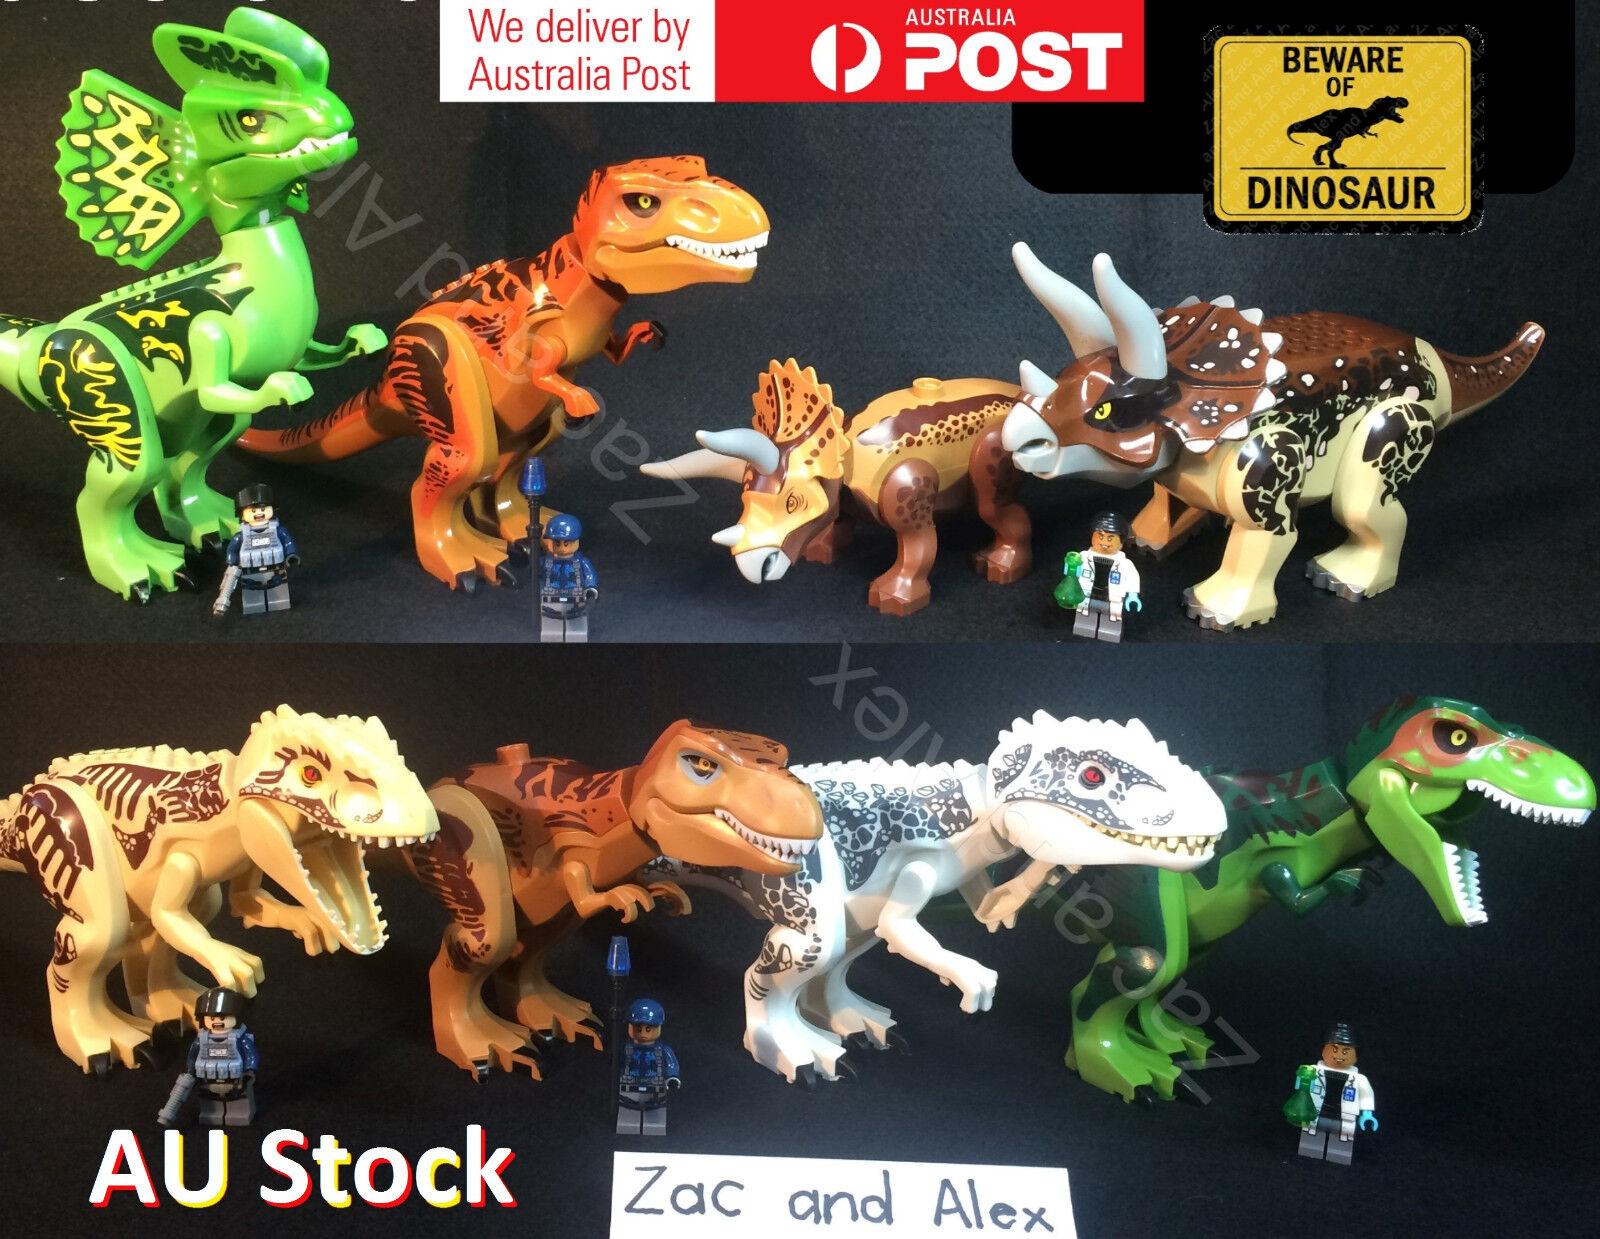 envío rápido en todo el mundo XL Dinosaurio Dinosaurio Dinosaurio Tiranosaurio parque  funciona Con Dinosaurios Jurassic World Lego Juguete  barato en línea